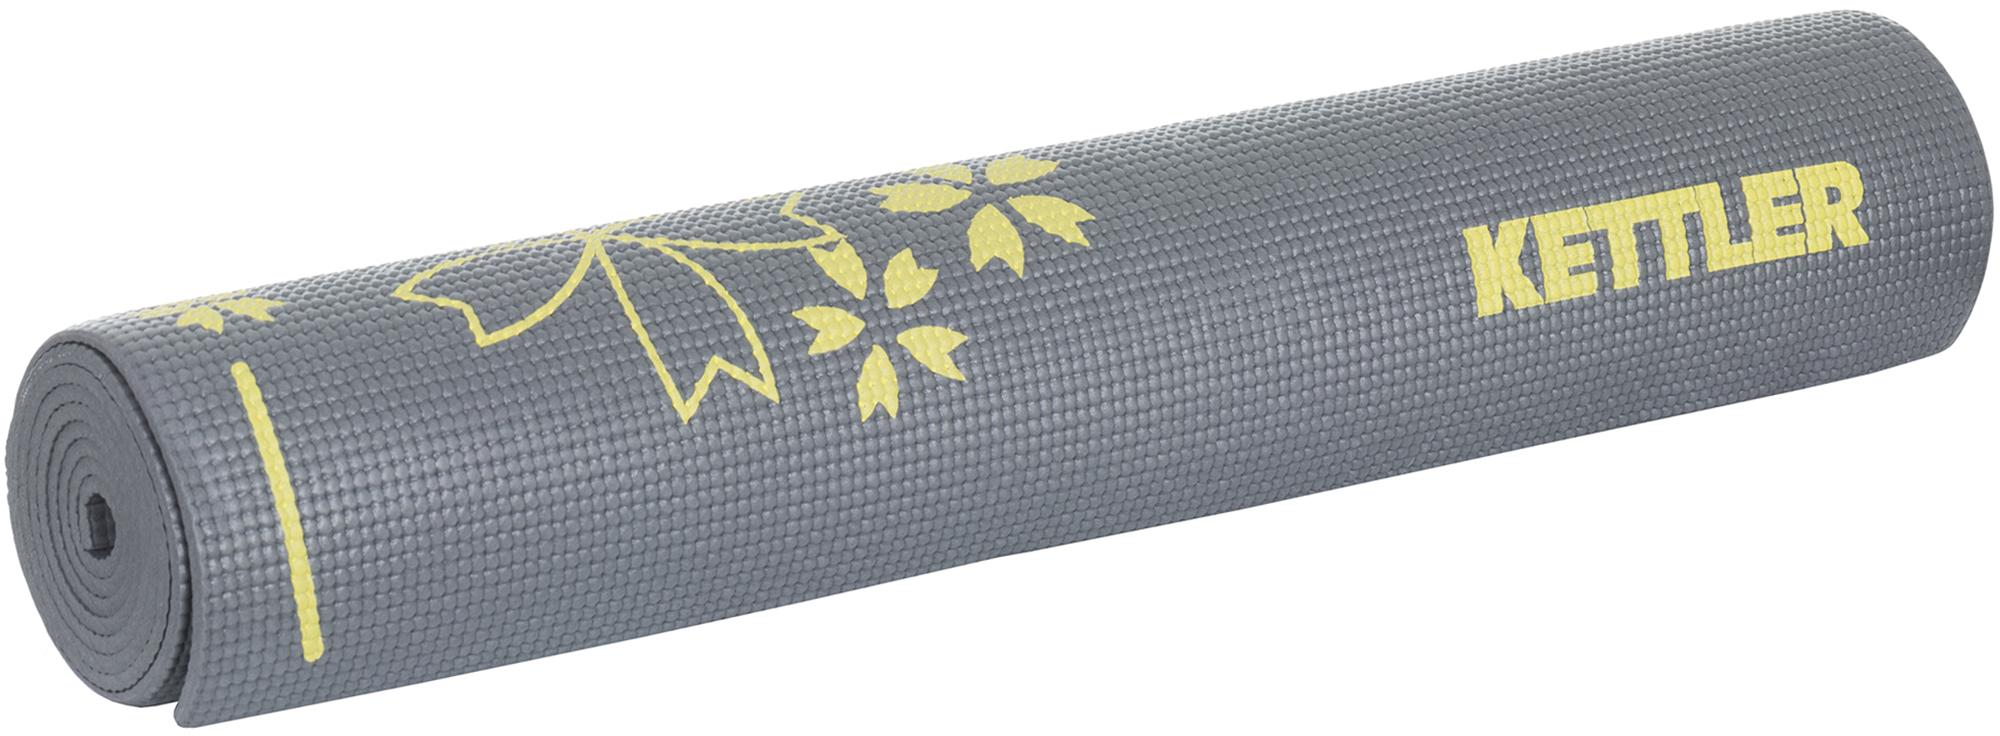 Kettler Коврик для йоги Kettler коврик для йоги с рисунком atemi aym 01 pic